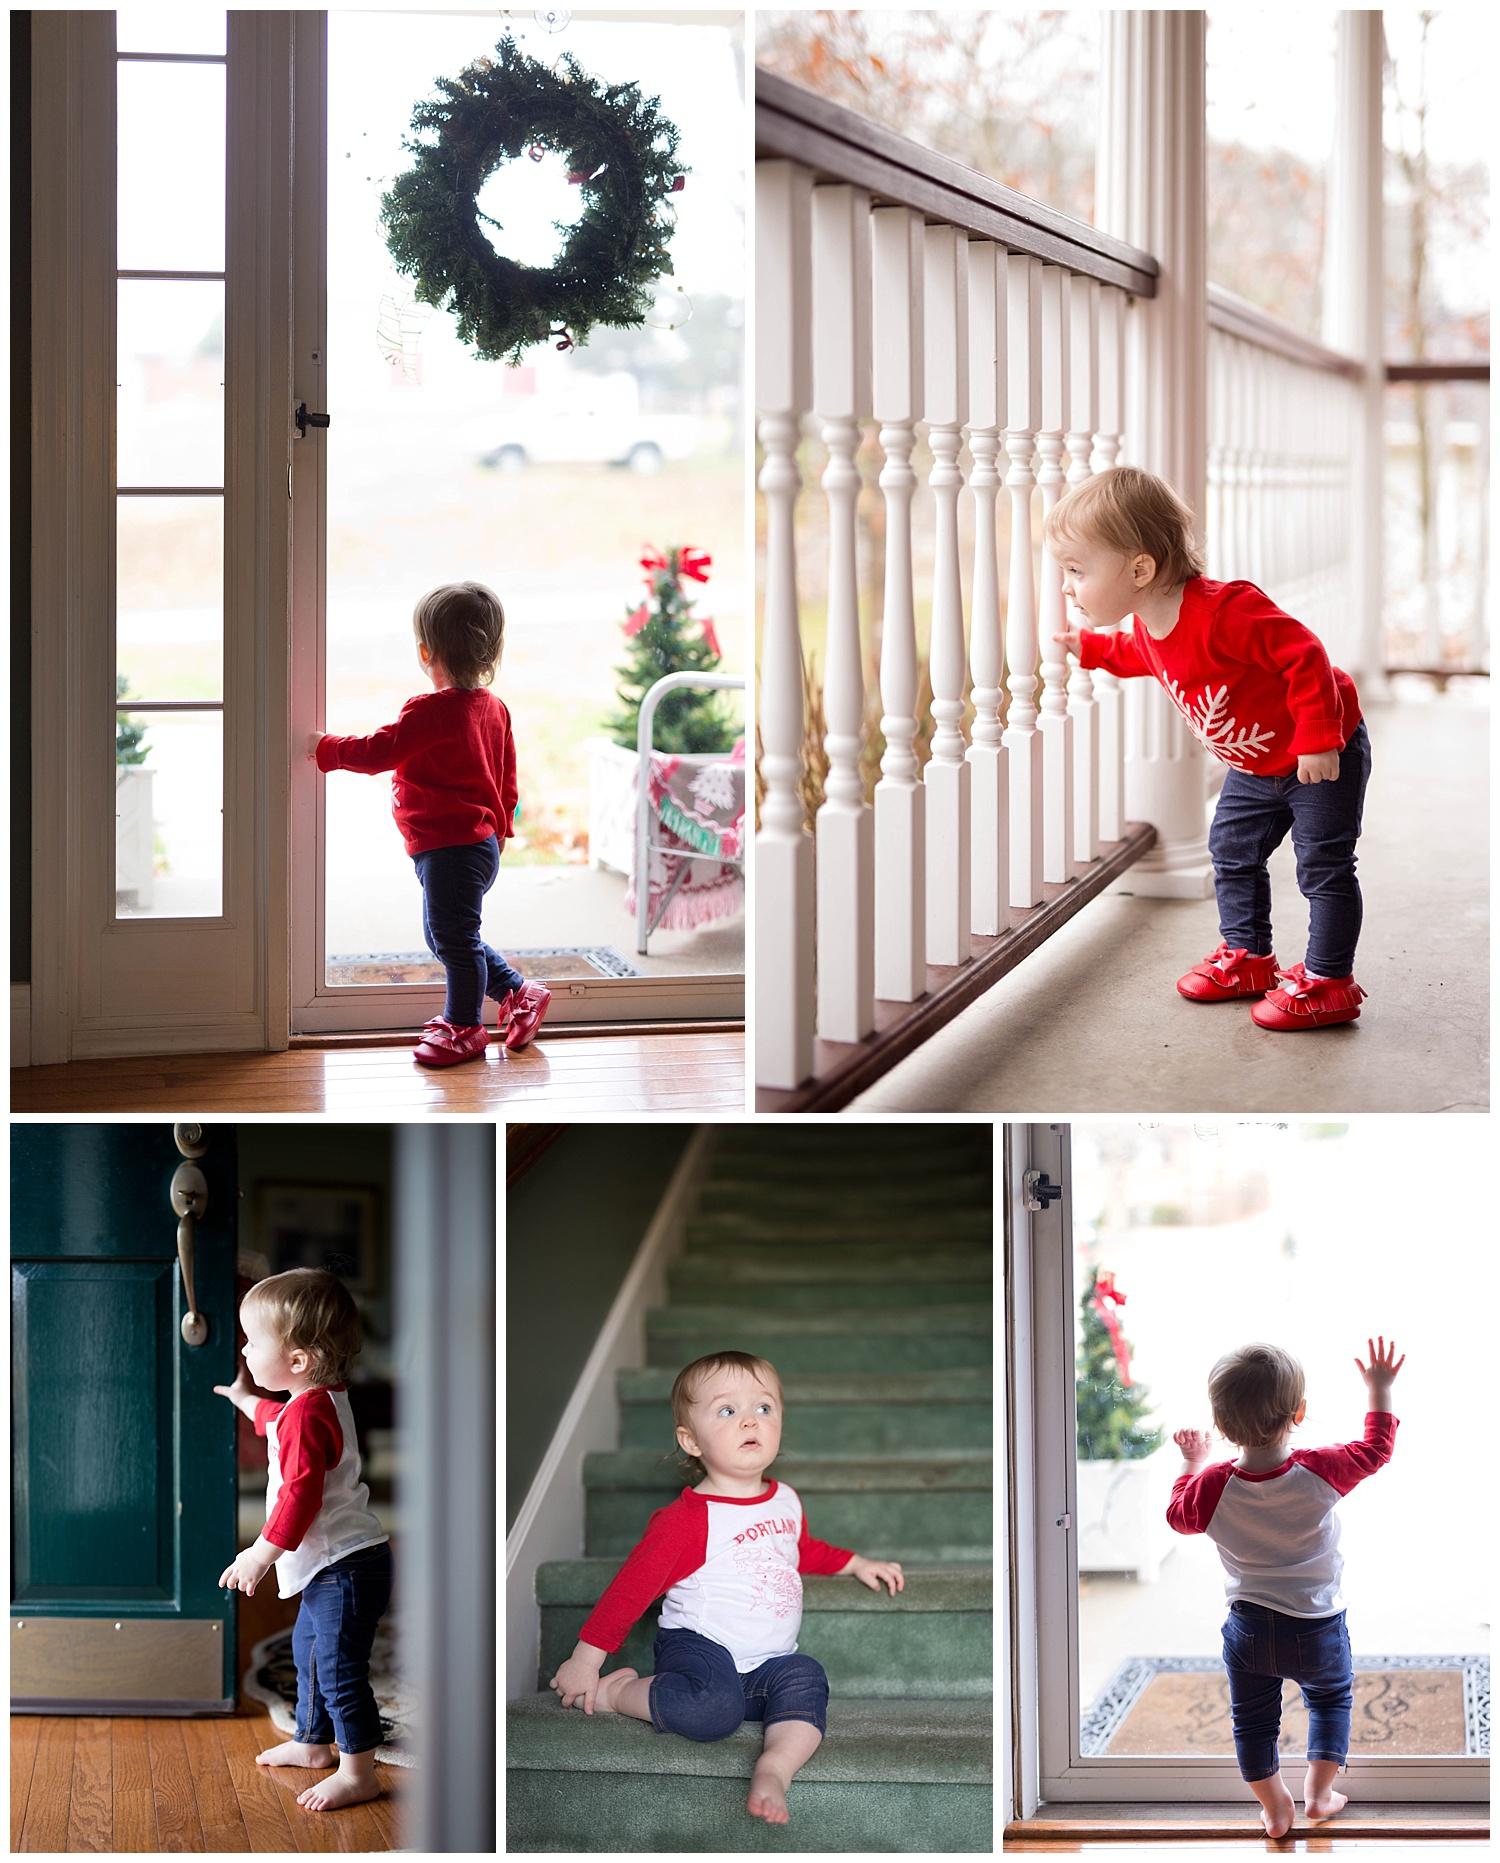 toddler exploring grandparents' house